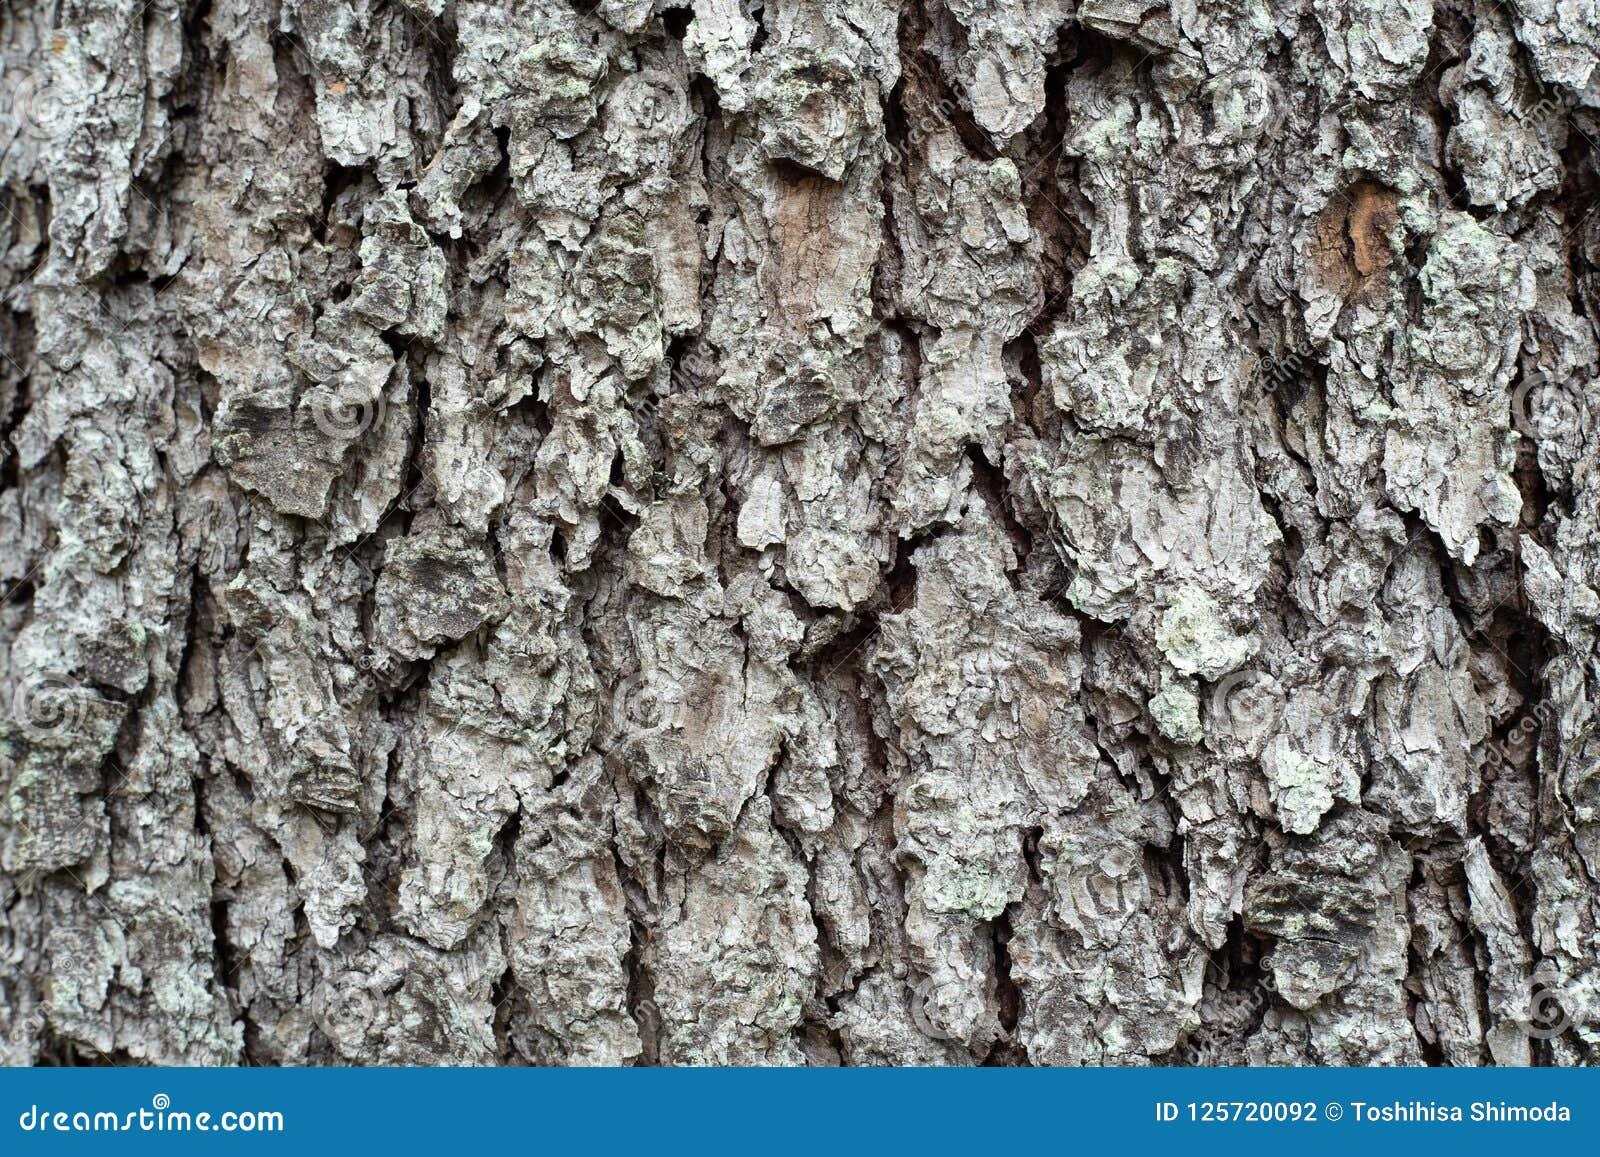 Cedar wood bark.